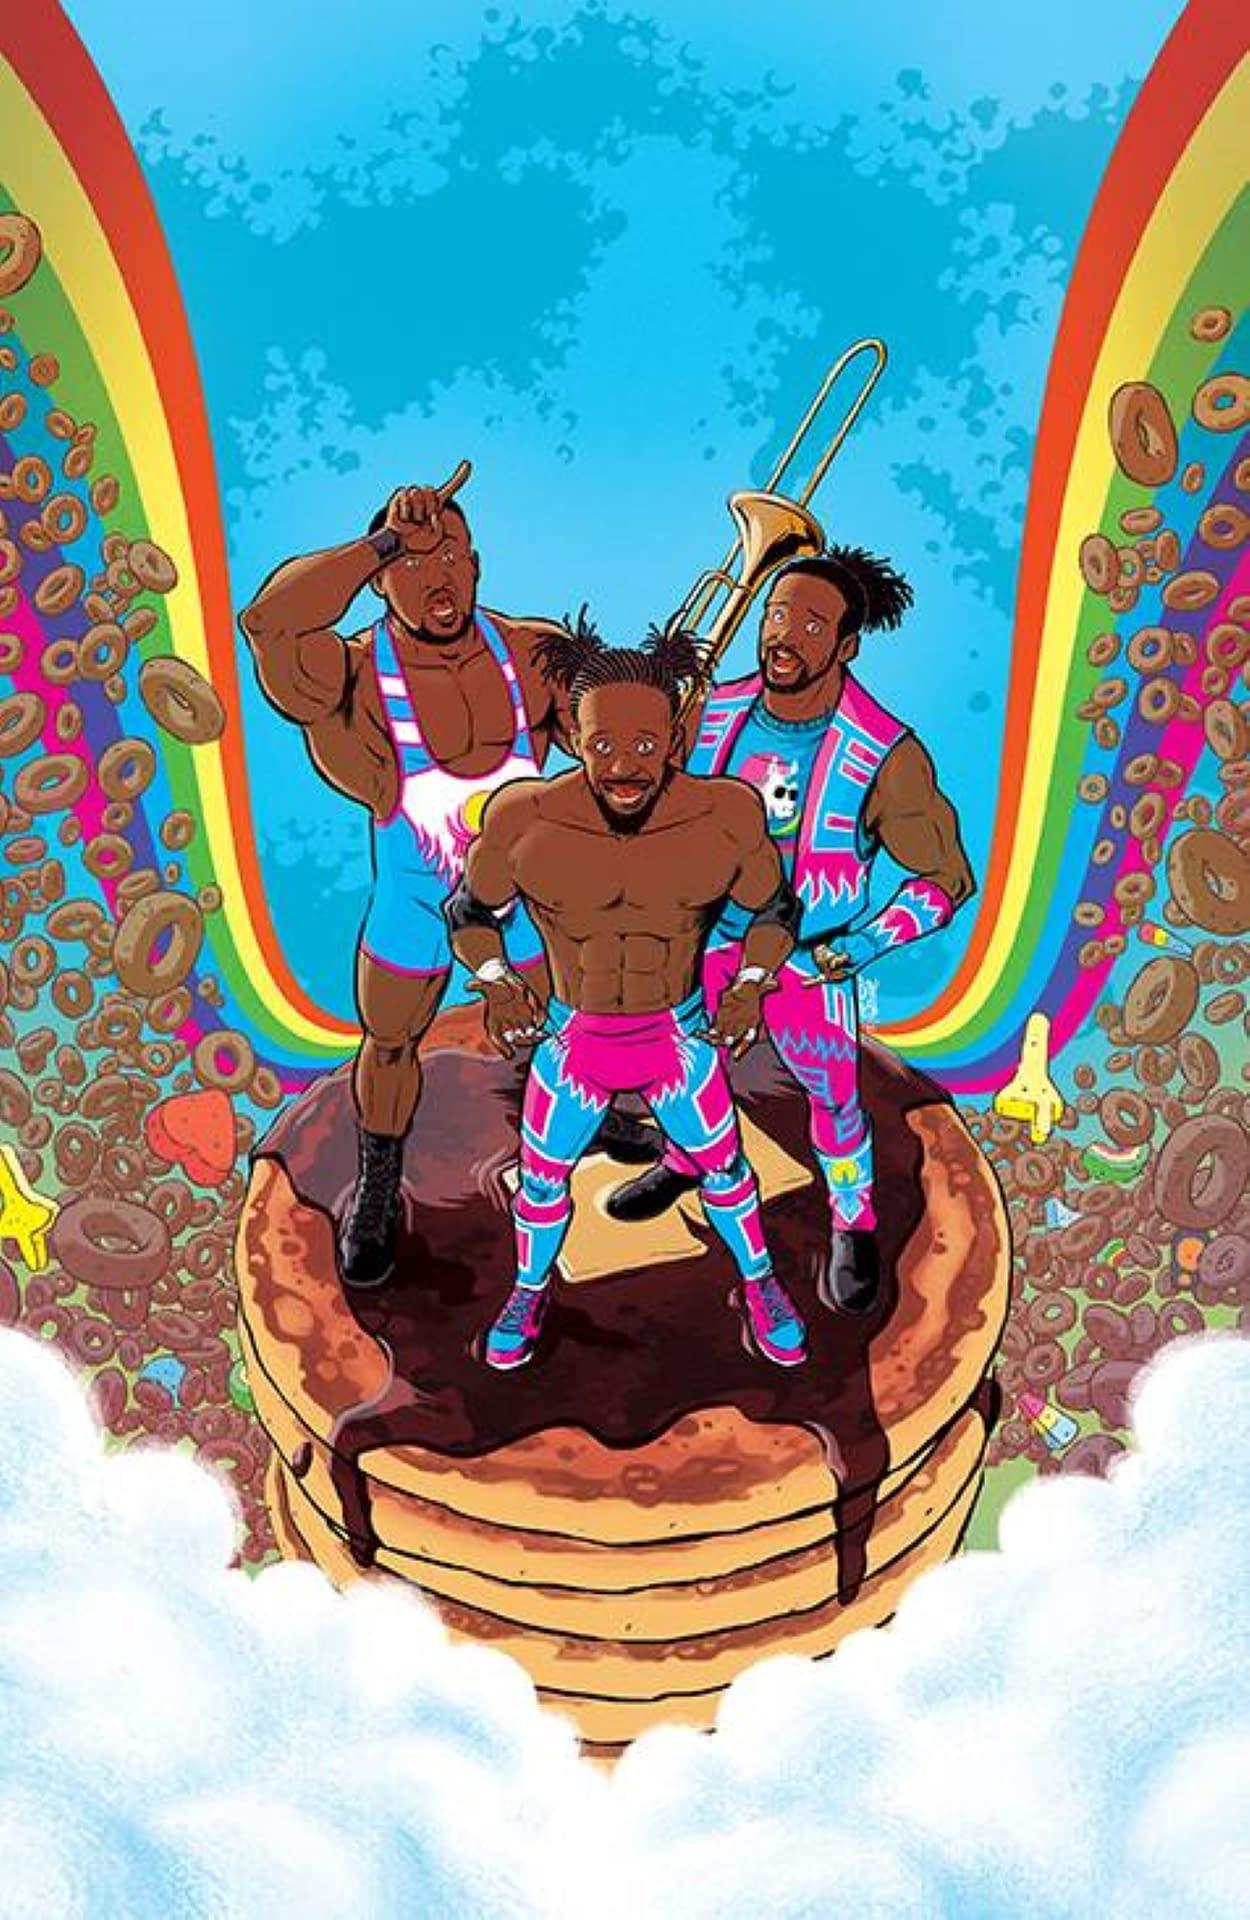 WWE NEW DAY POWER OF POSITIVITY #1 (OF 2) CVR A BAYLISS